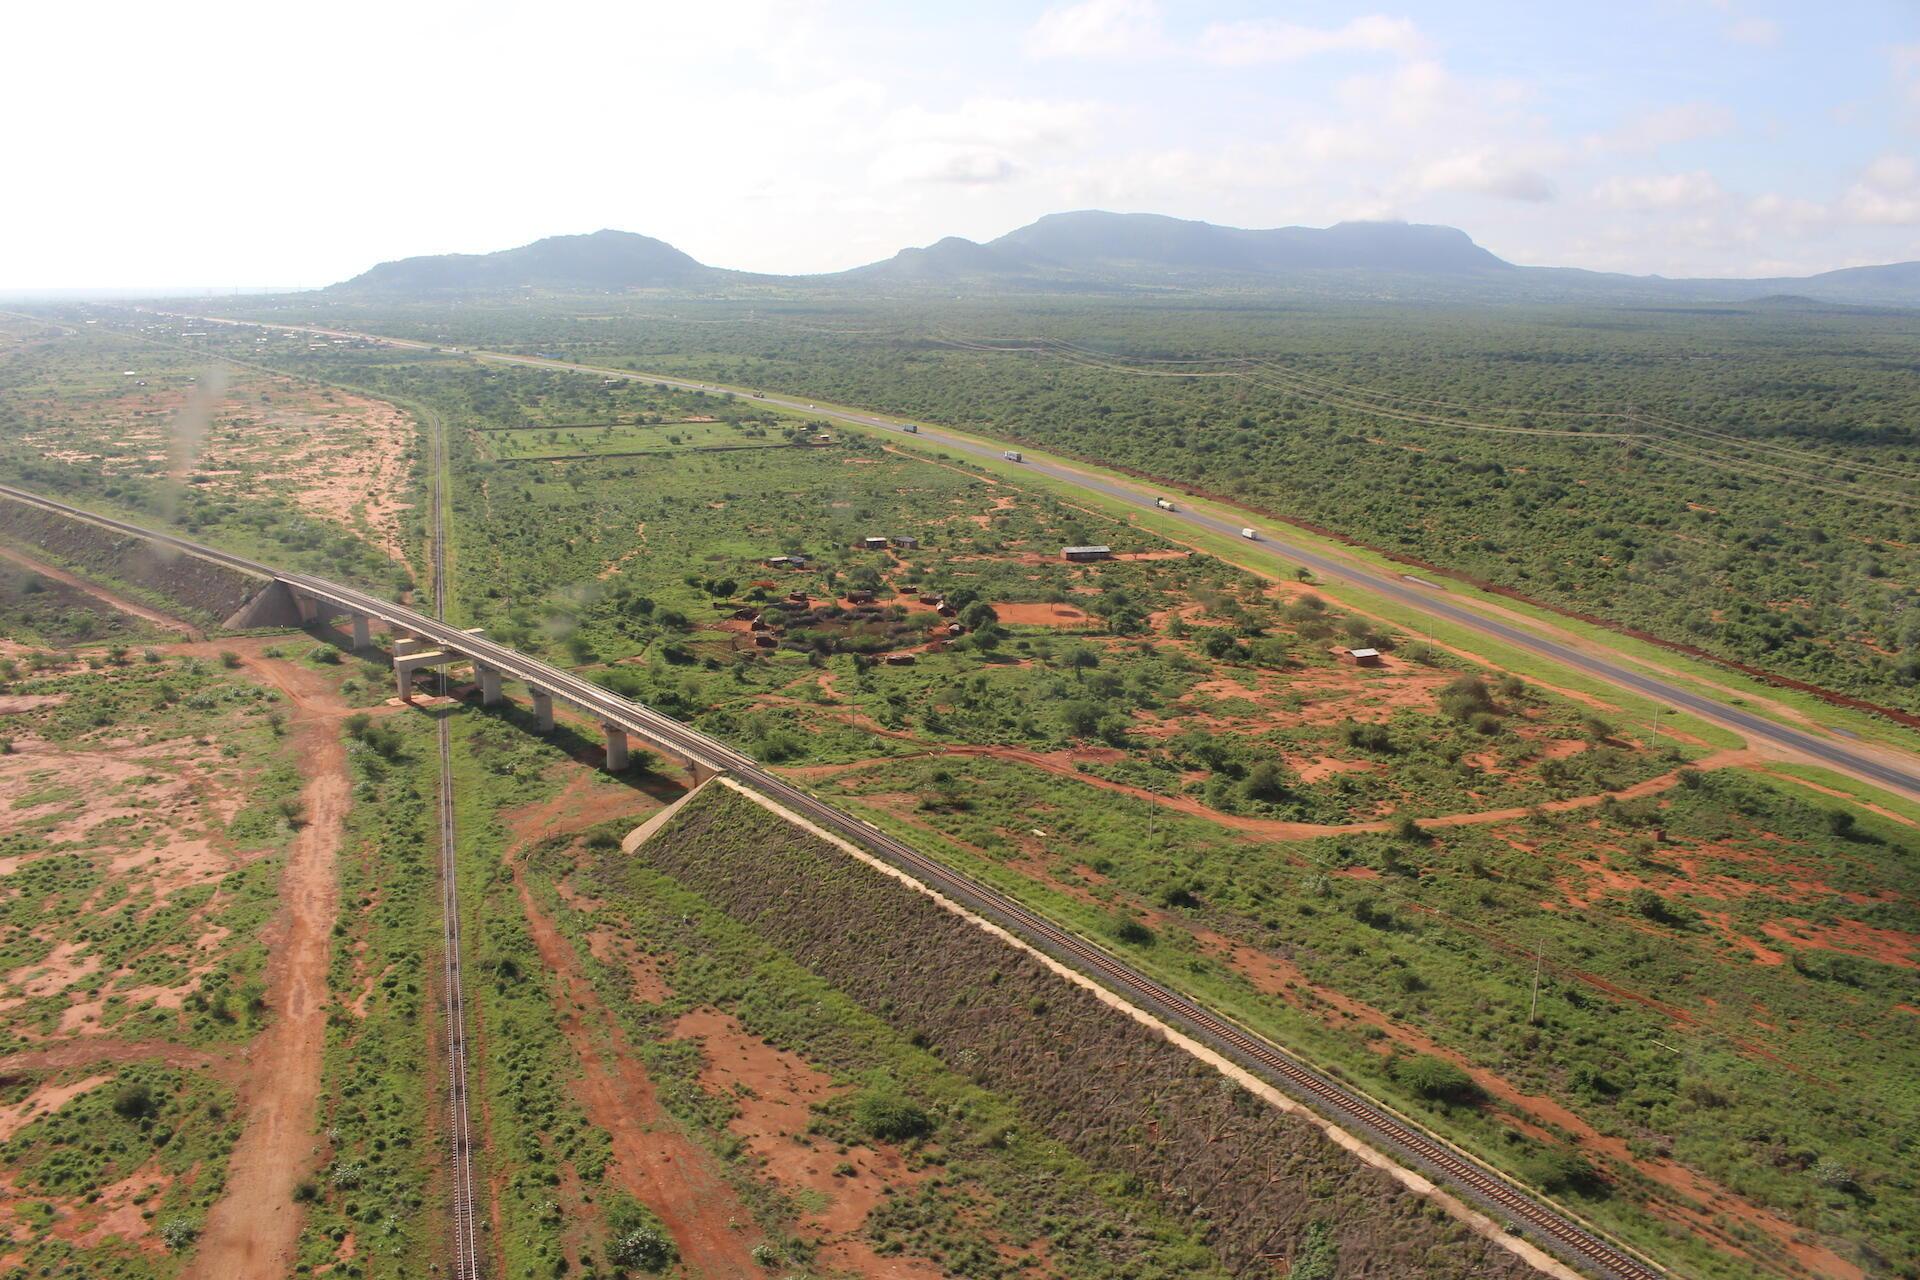 Bridges allow wildlife to pass beneath them_Kenya_Credit Ewan Brennan